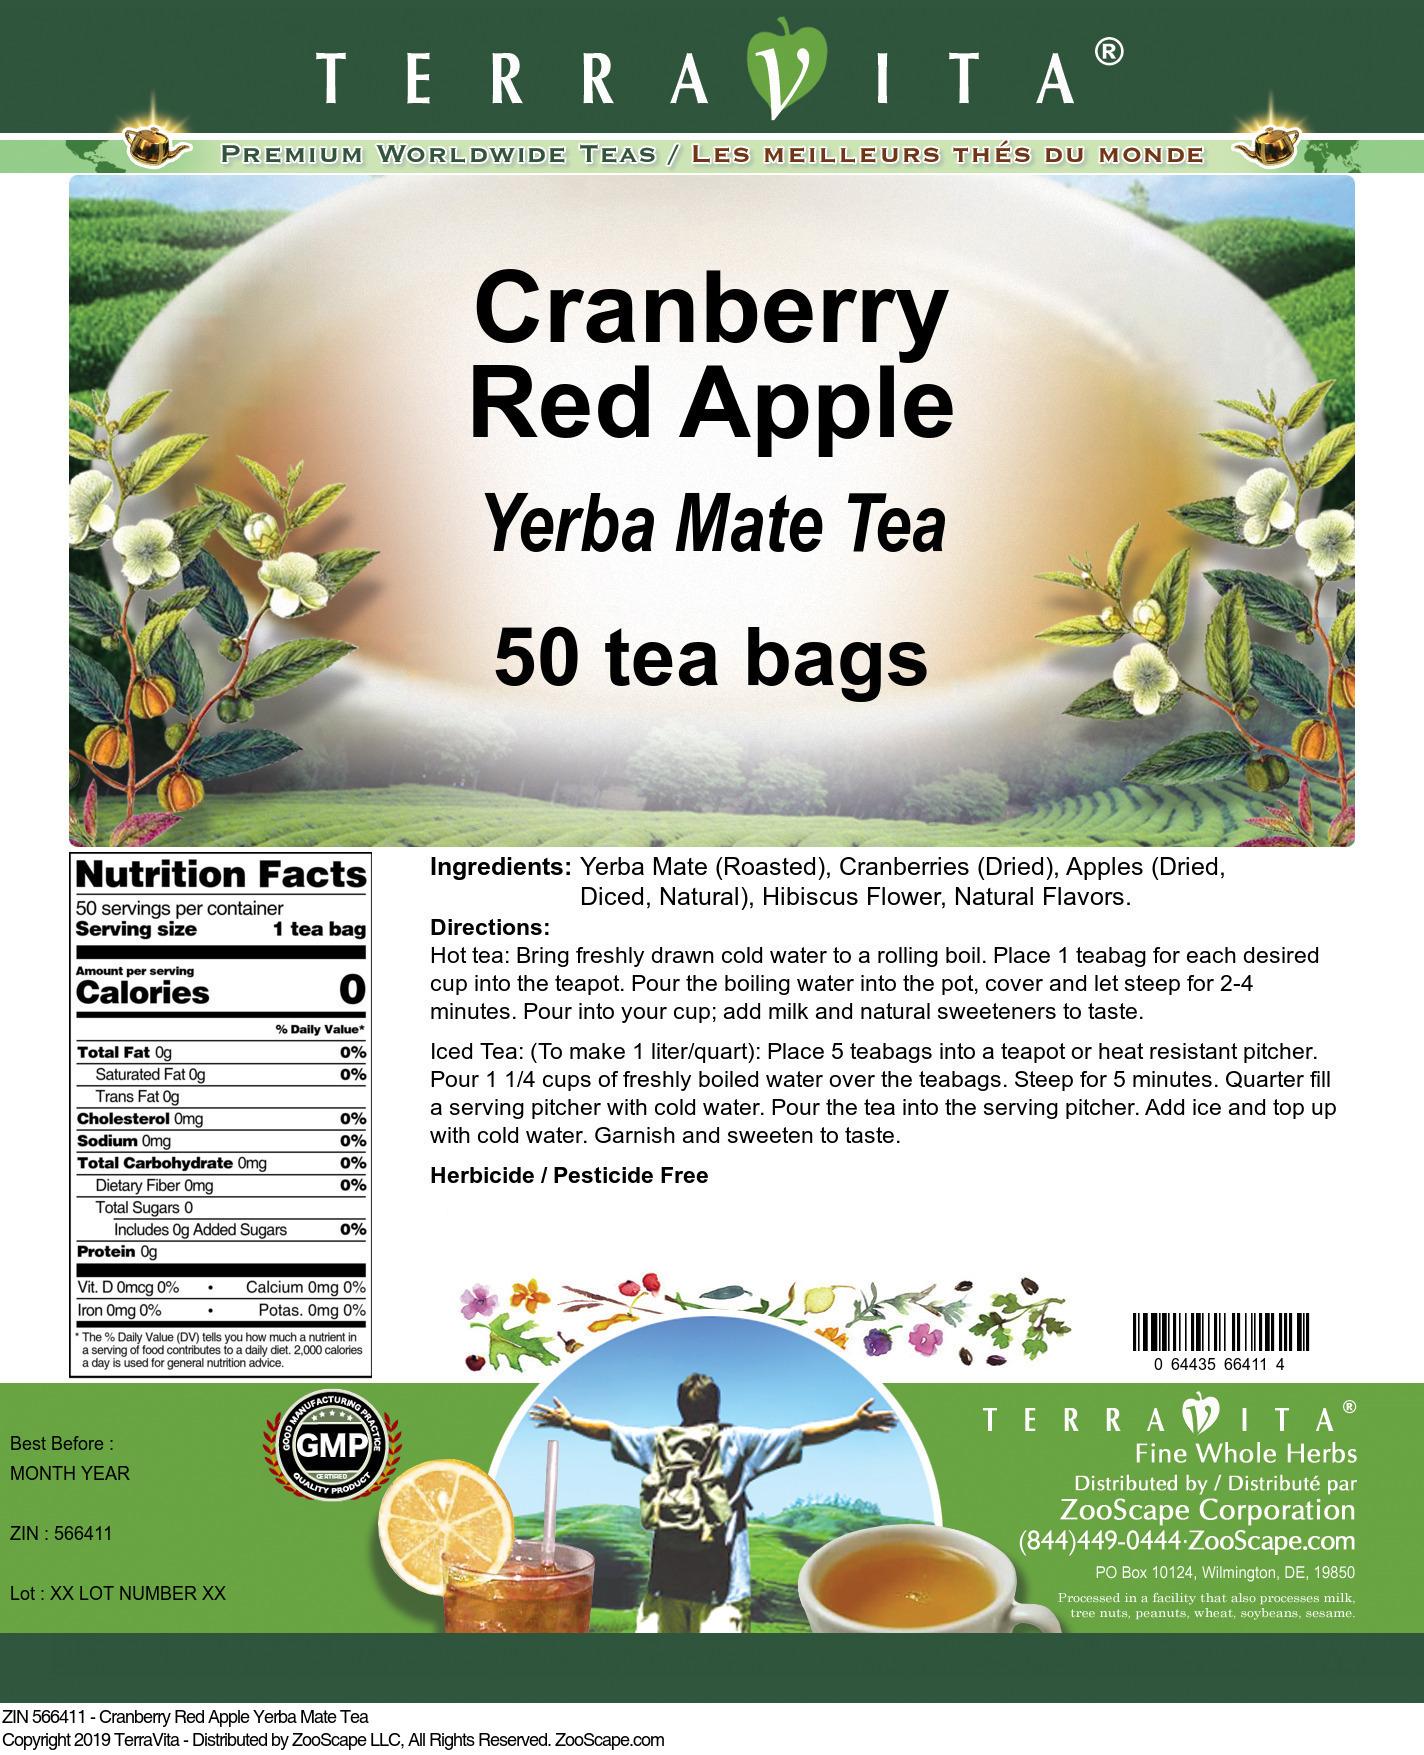 Cranberry Red Apple Yerba Mate Tea